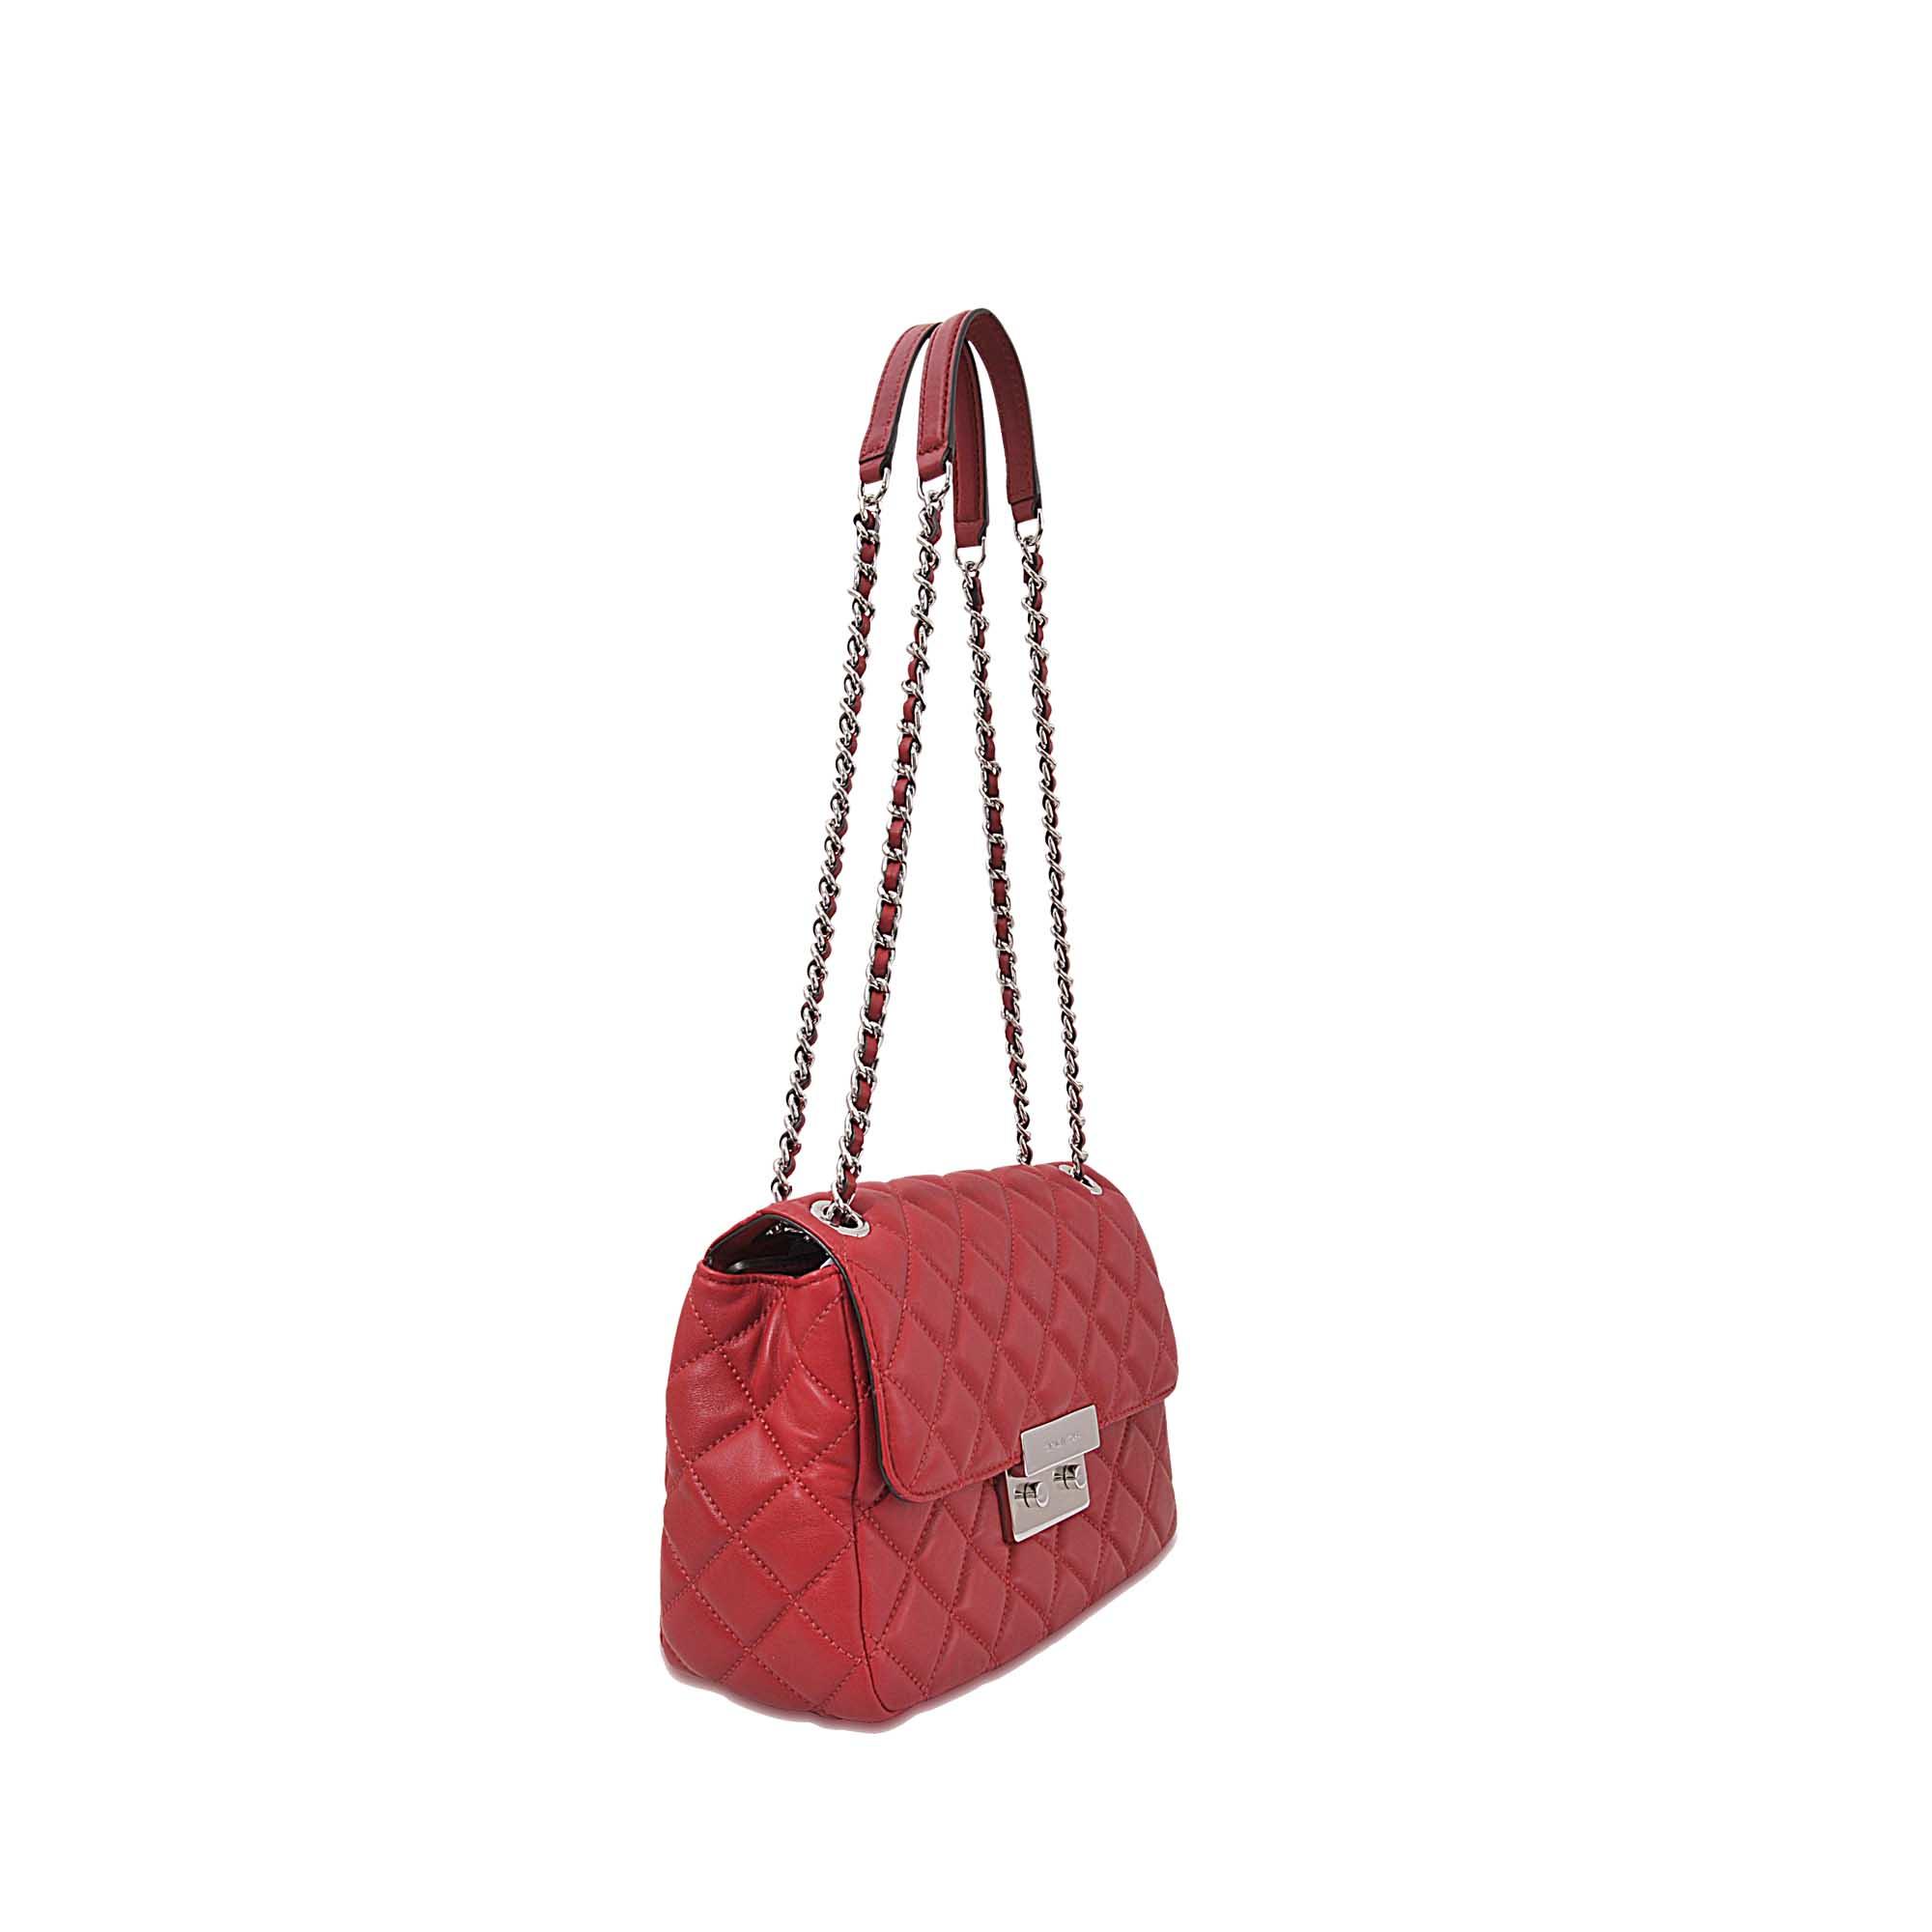 30ddd822feb Lyst - MICHAEL Michael Kors Sloan Lg Chain Shoulder Bag in Red